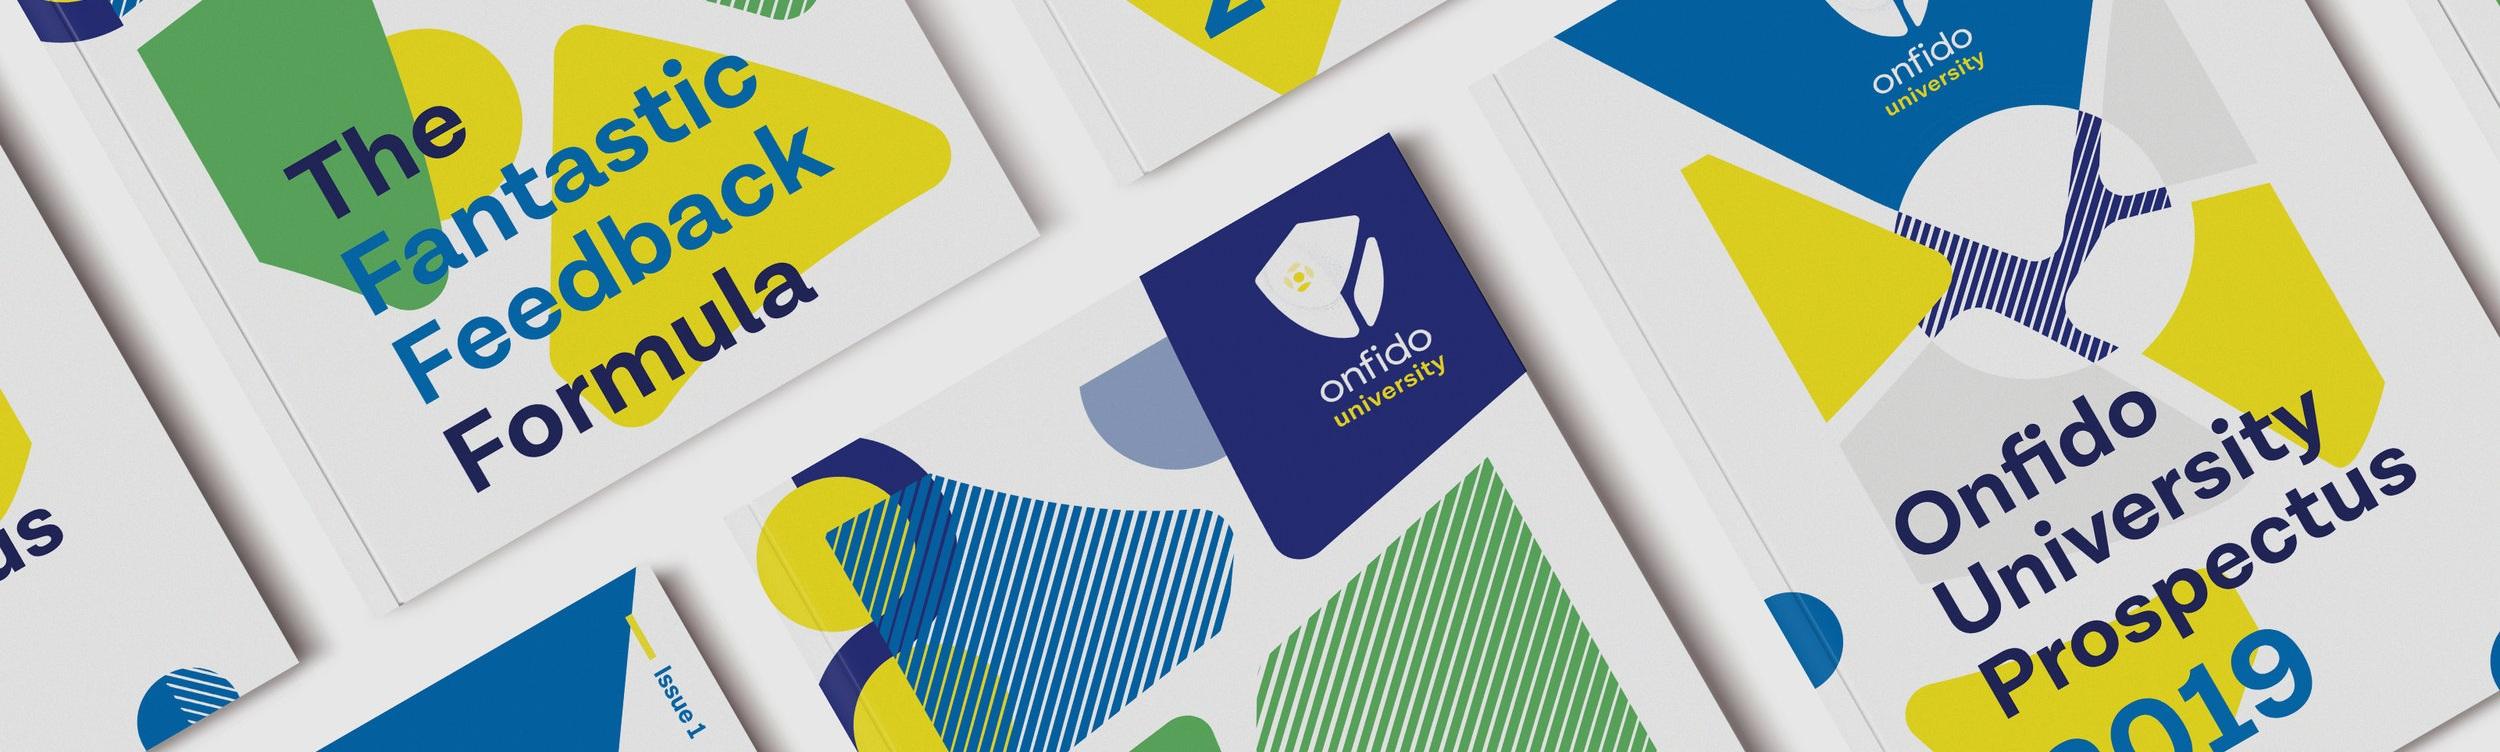 Onfido+University+documents